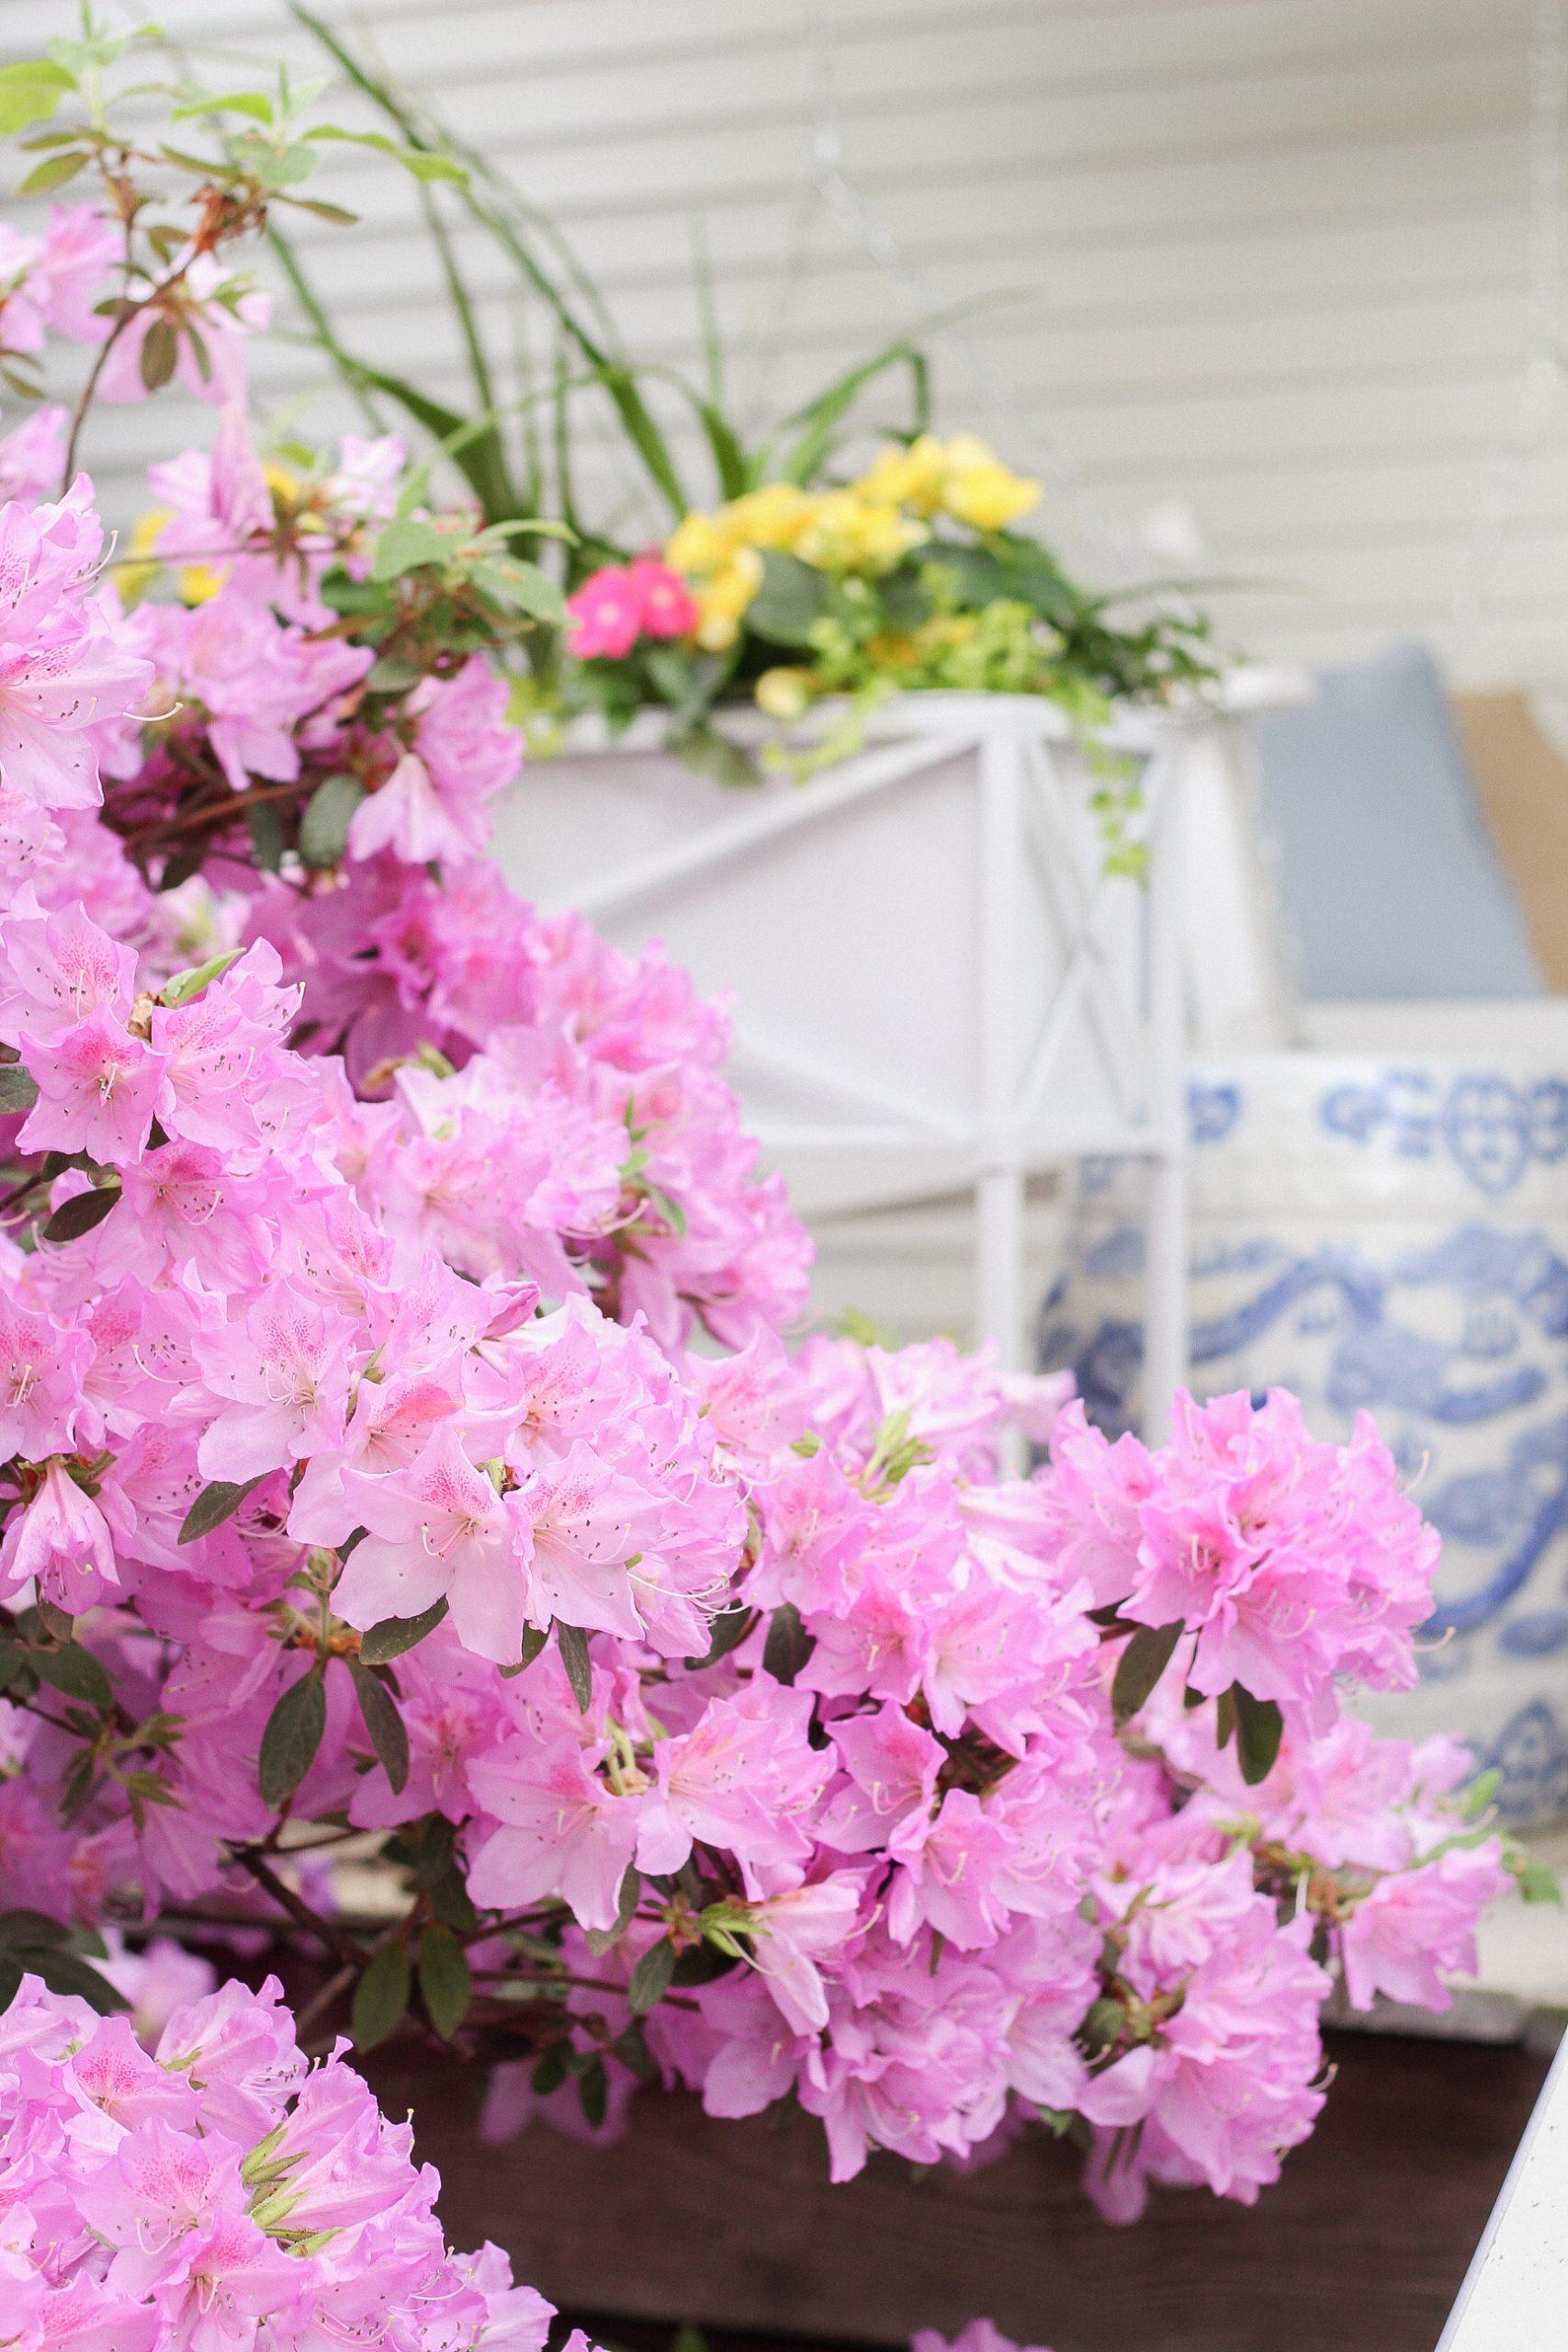 azaleas and flower boxes